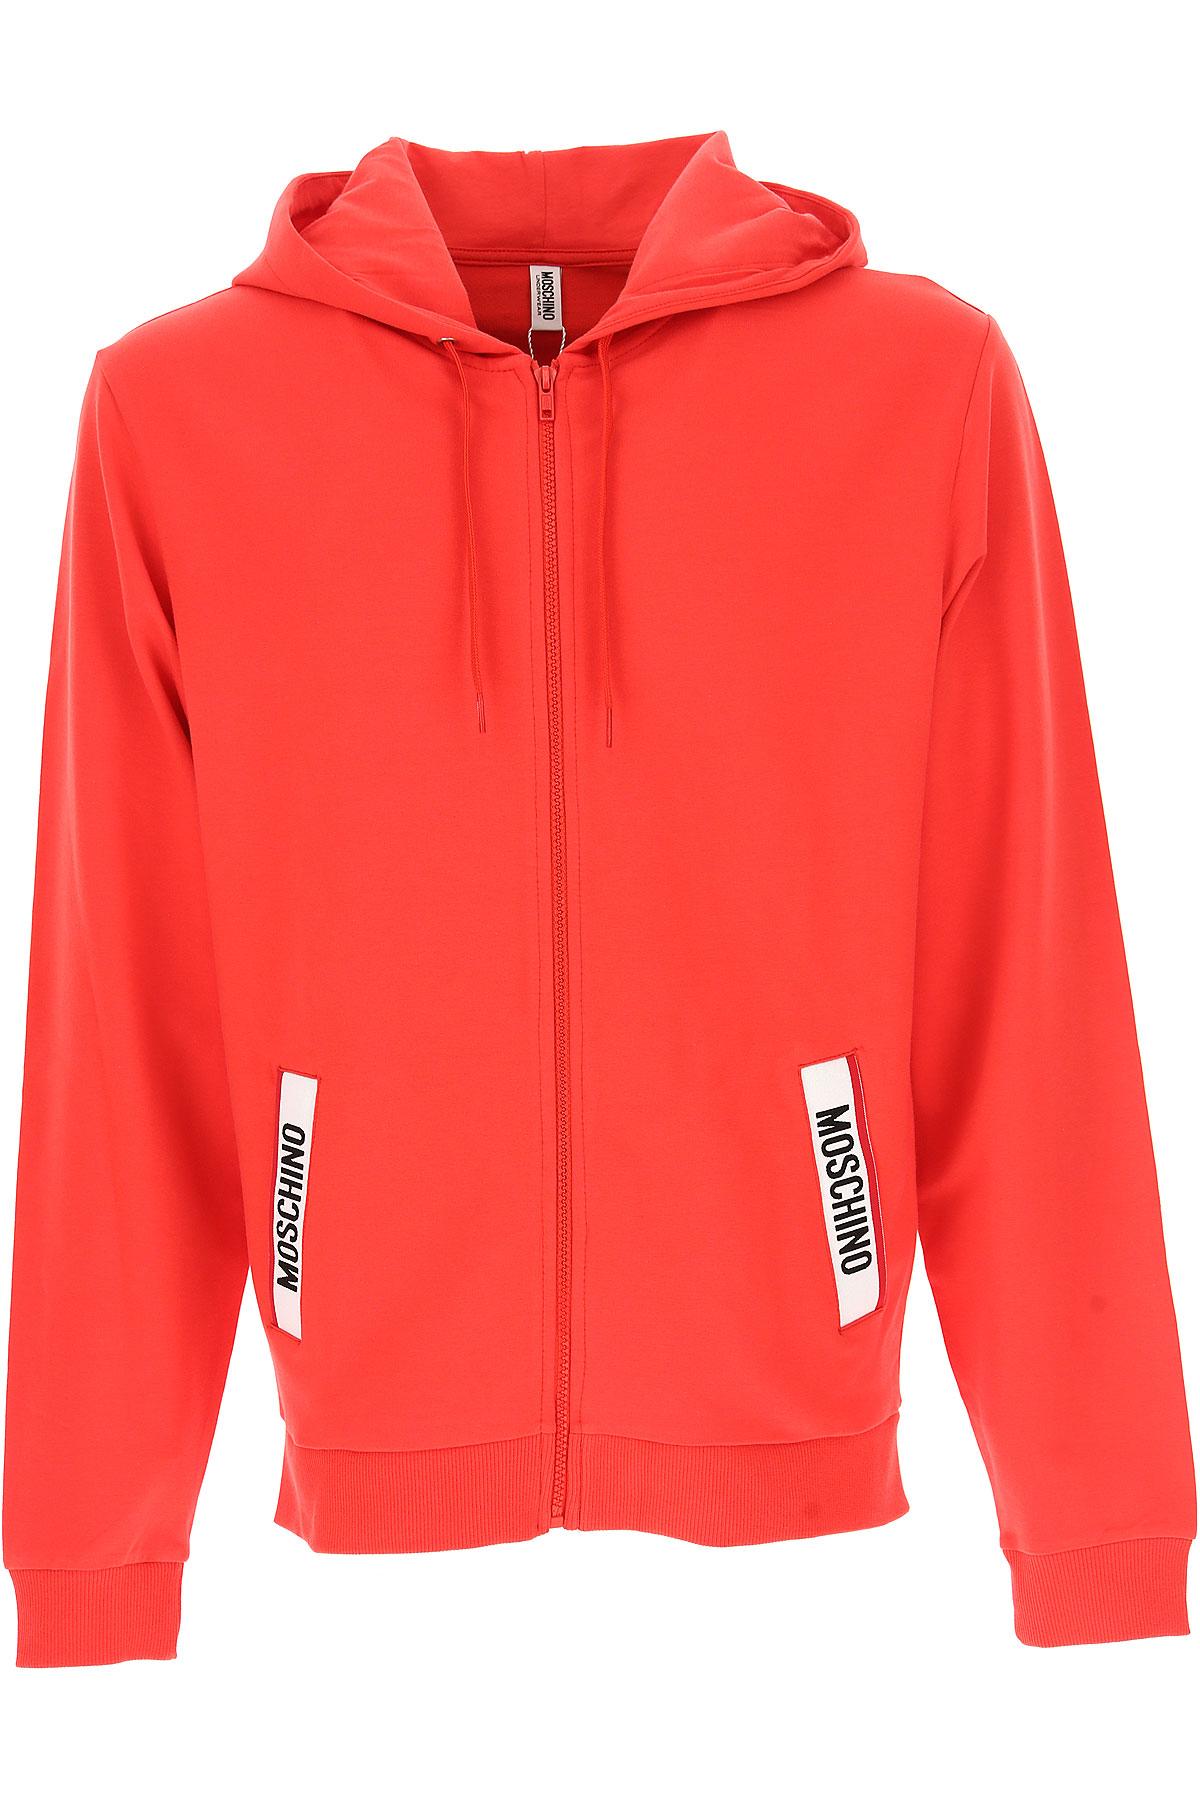 Moschino Sweatshirt for Men, Red, Cotton, 2017, L M S XL USA-444880